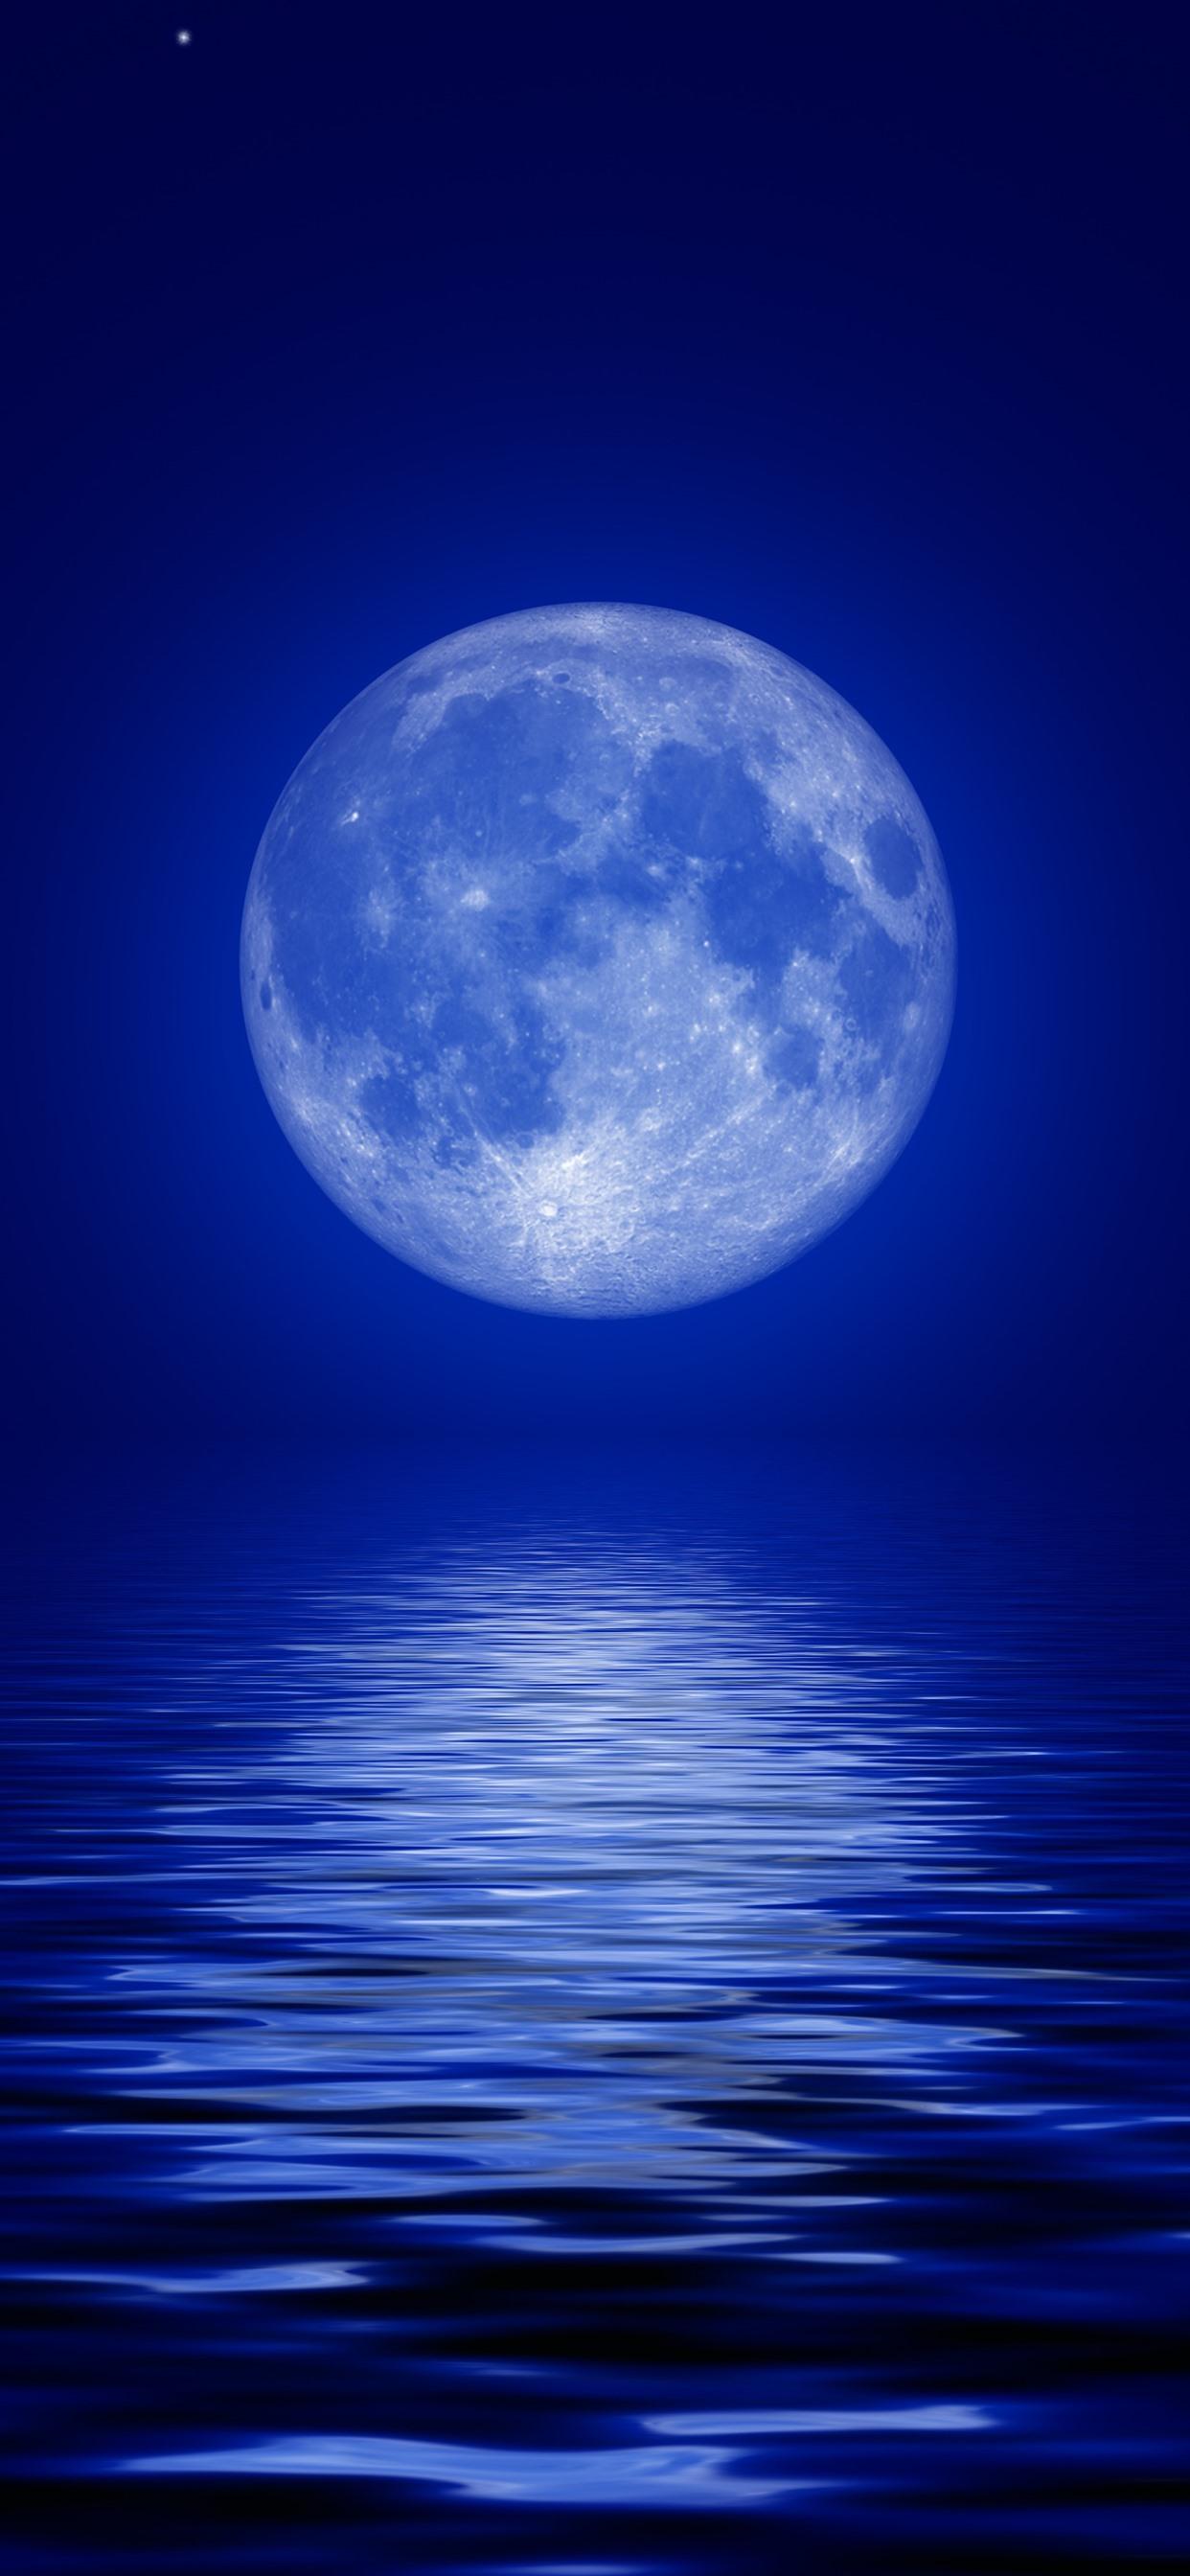 Moon Blue Sea Moonlight Night 1242x2688 Iphone Xs Max